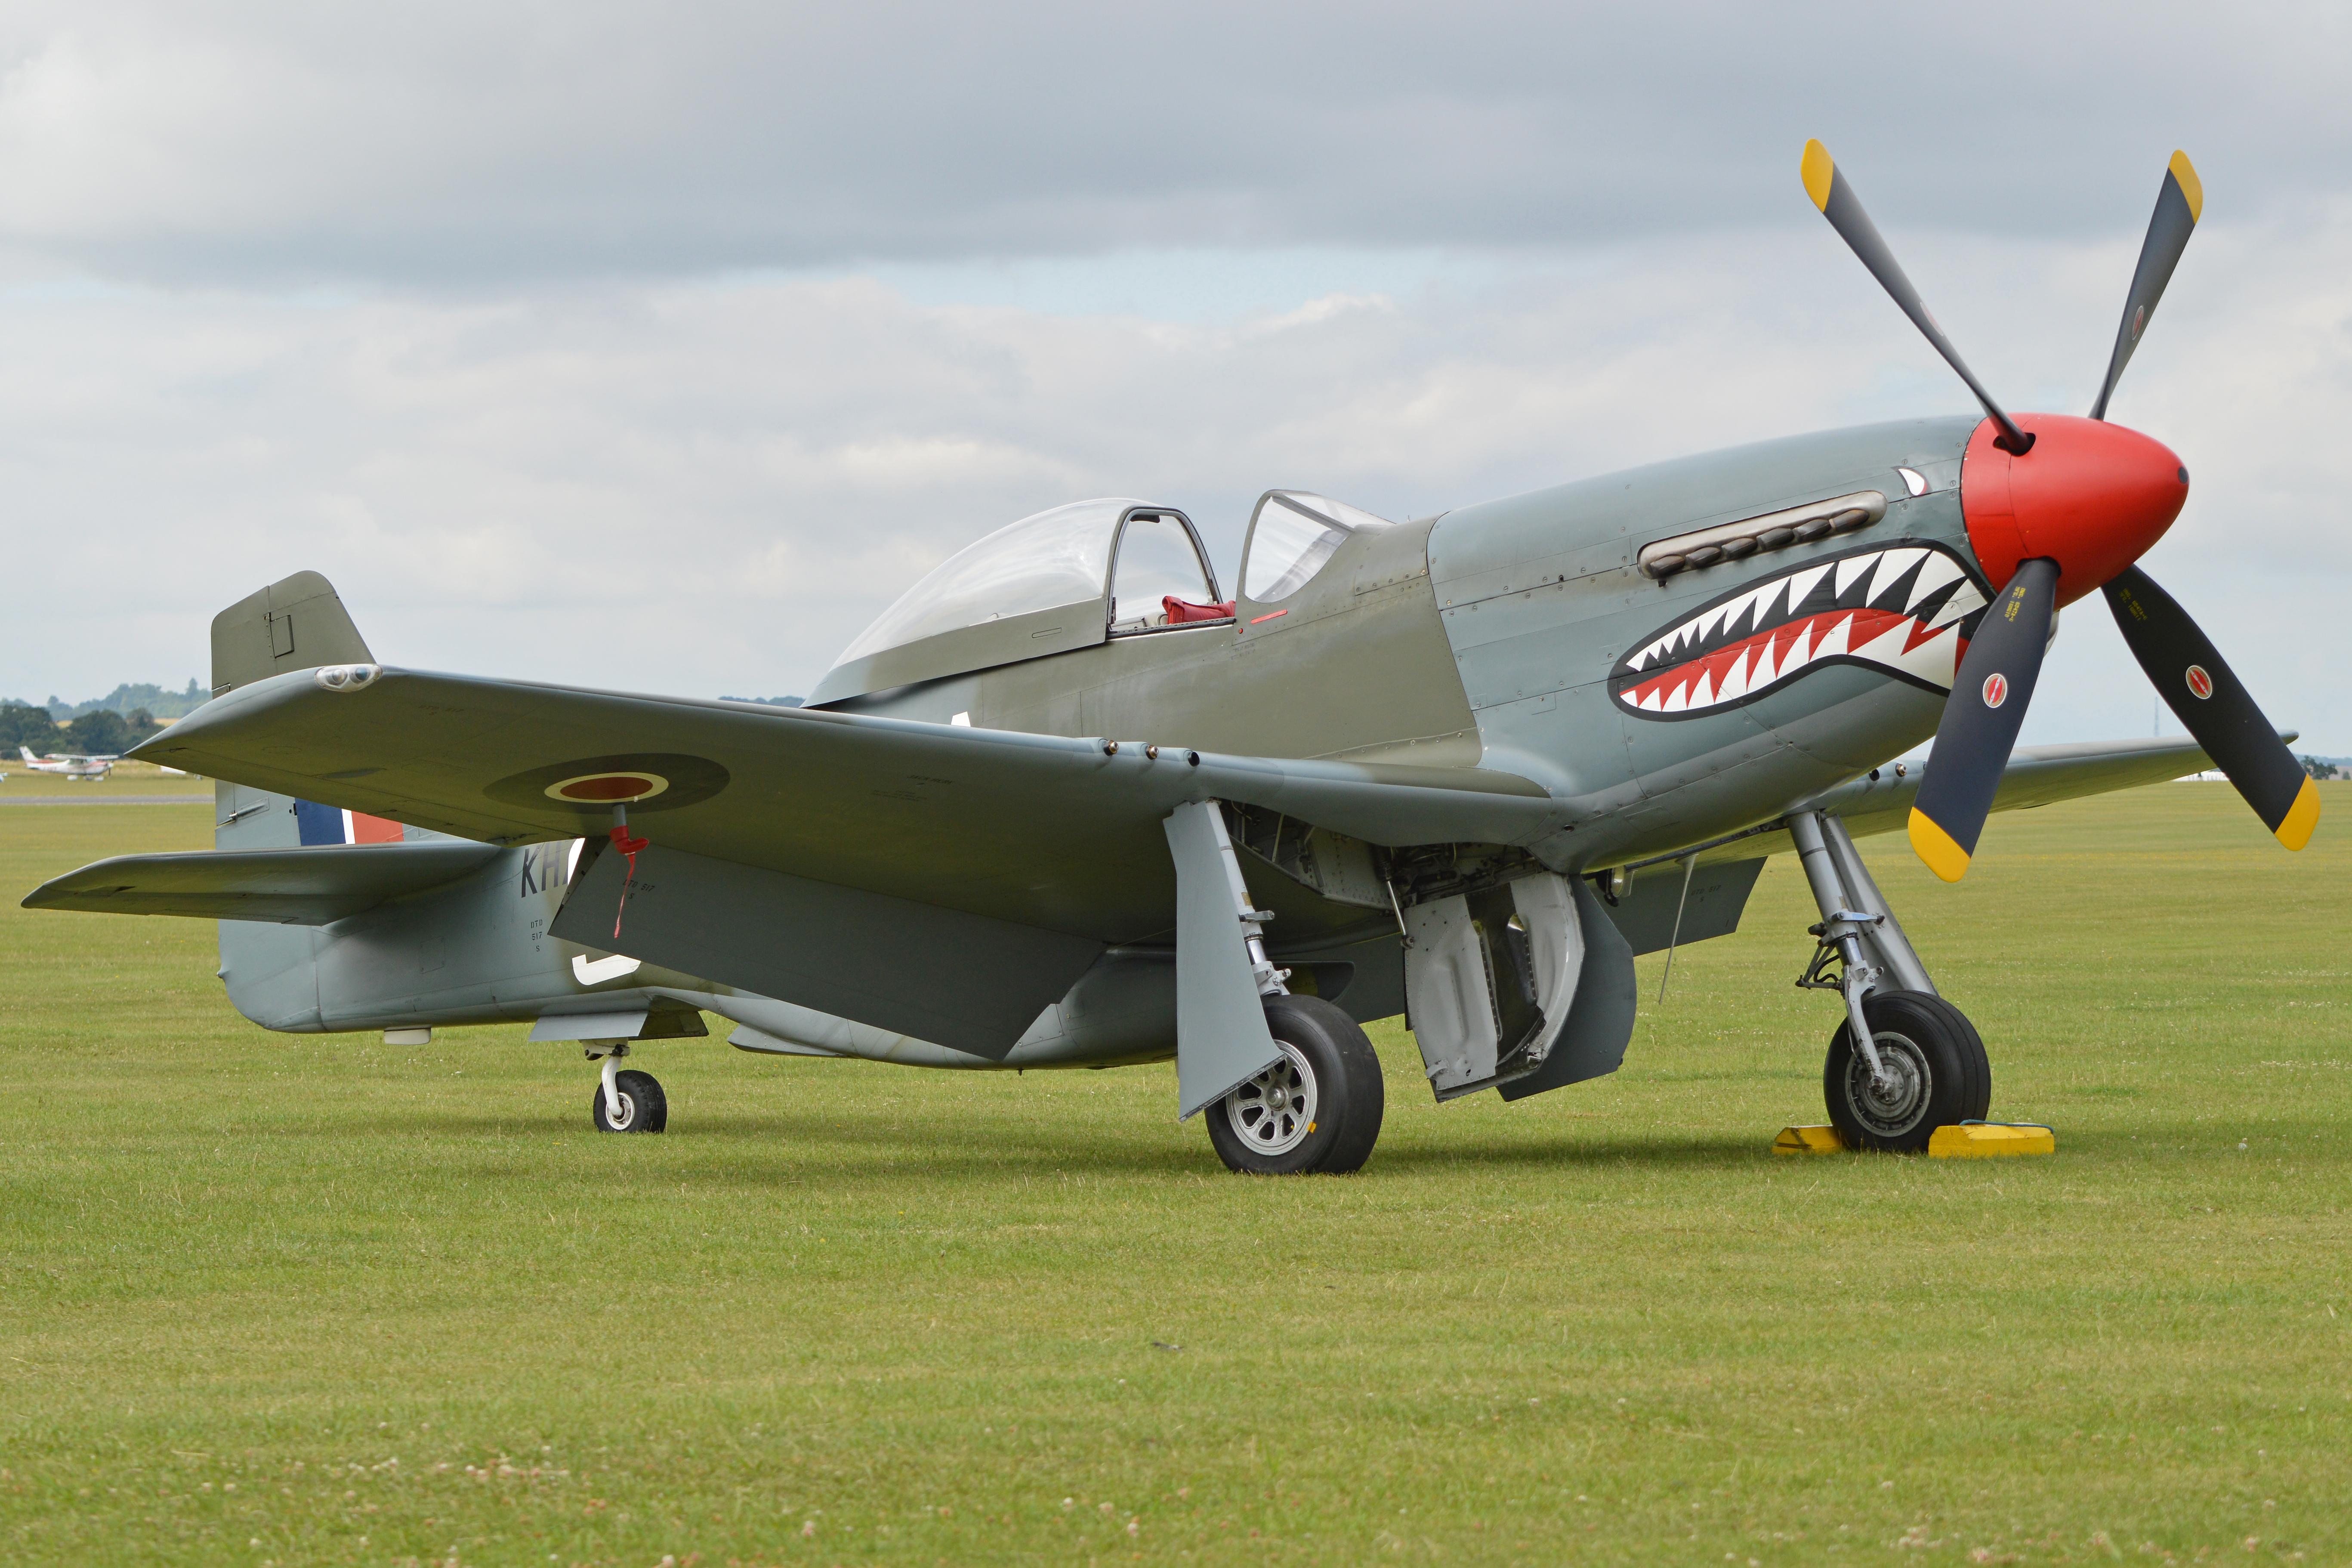 File:North American P-51D Mustang 'KH774 GA-S' (G-SHWN